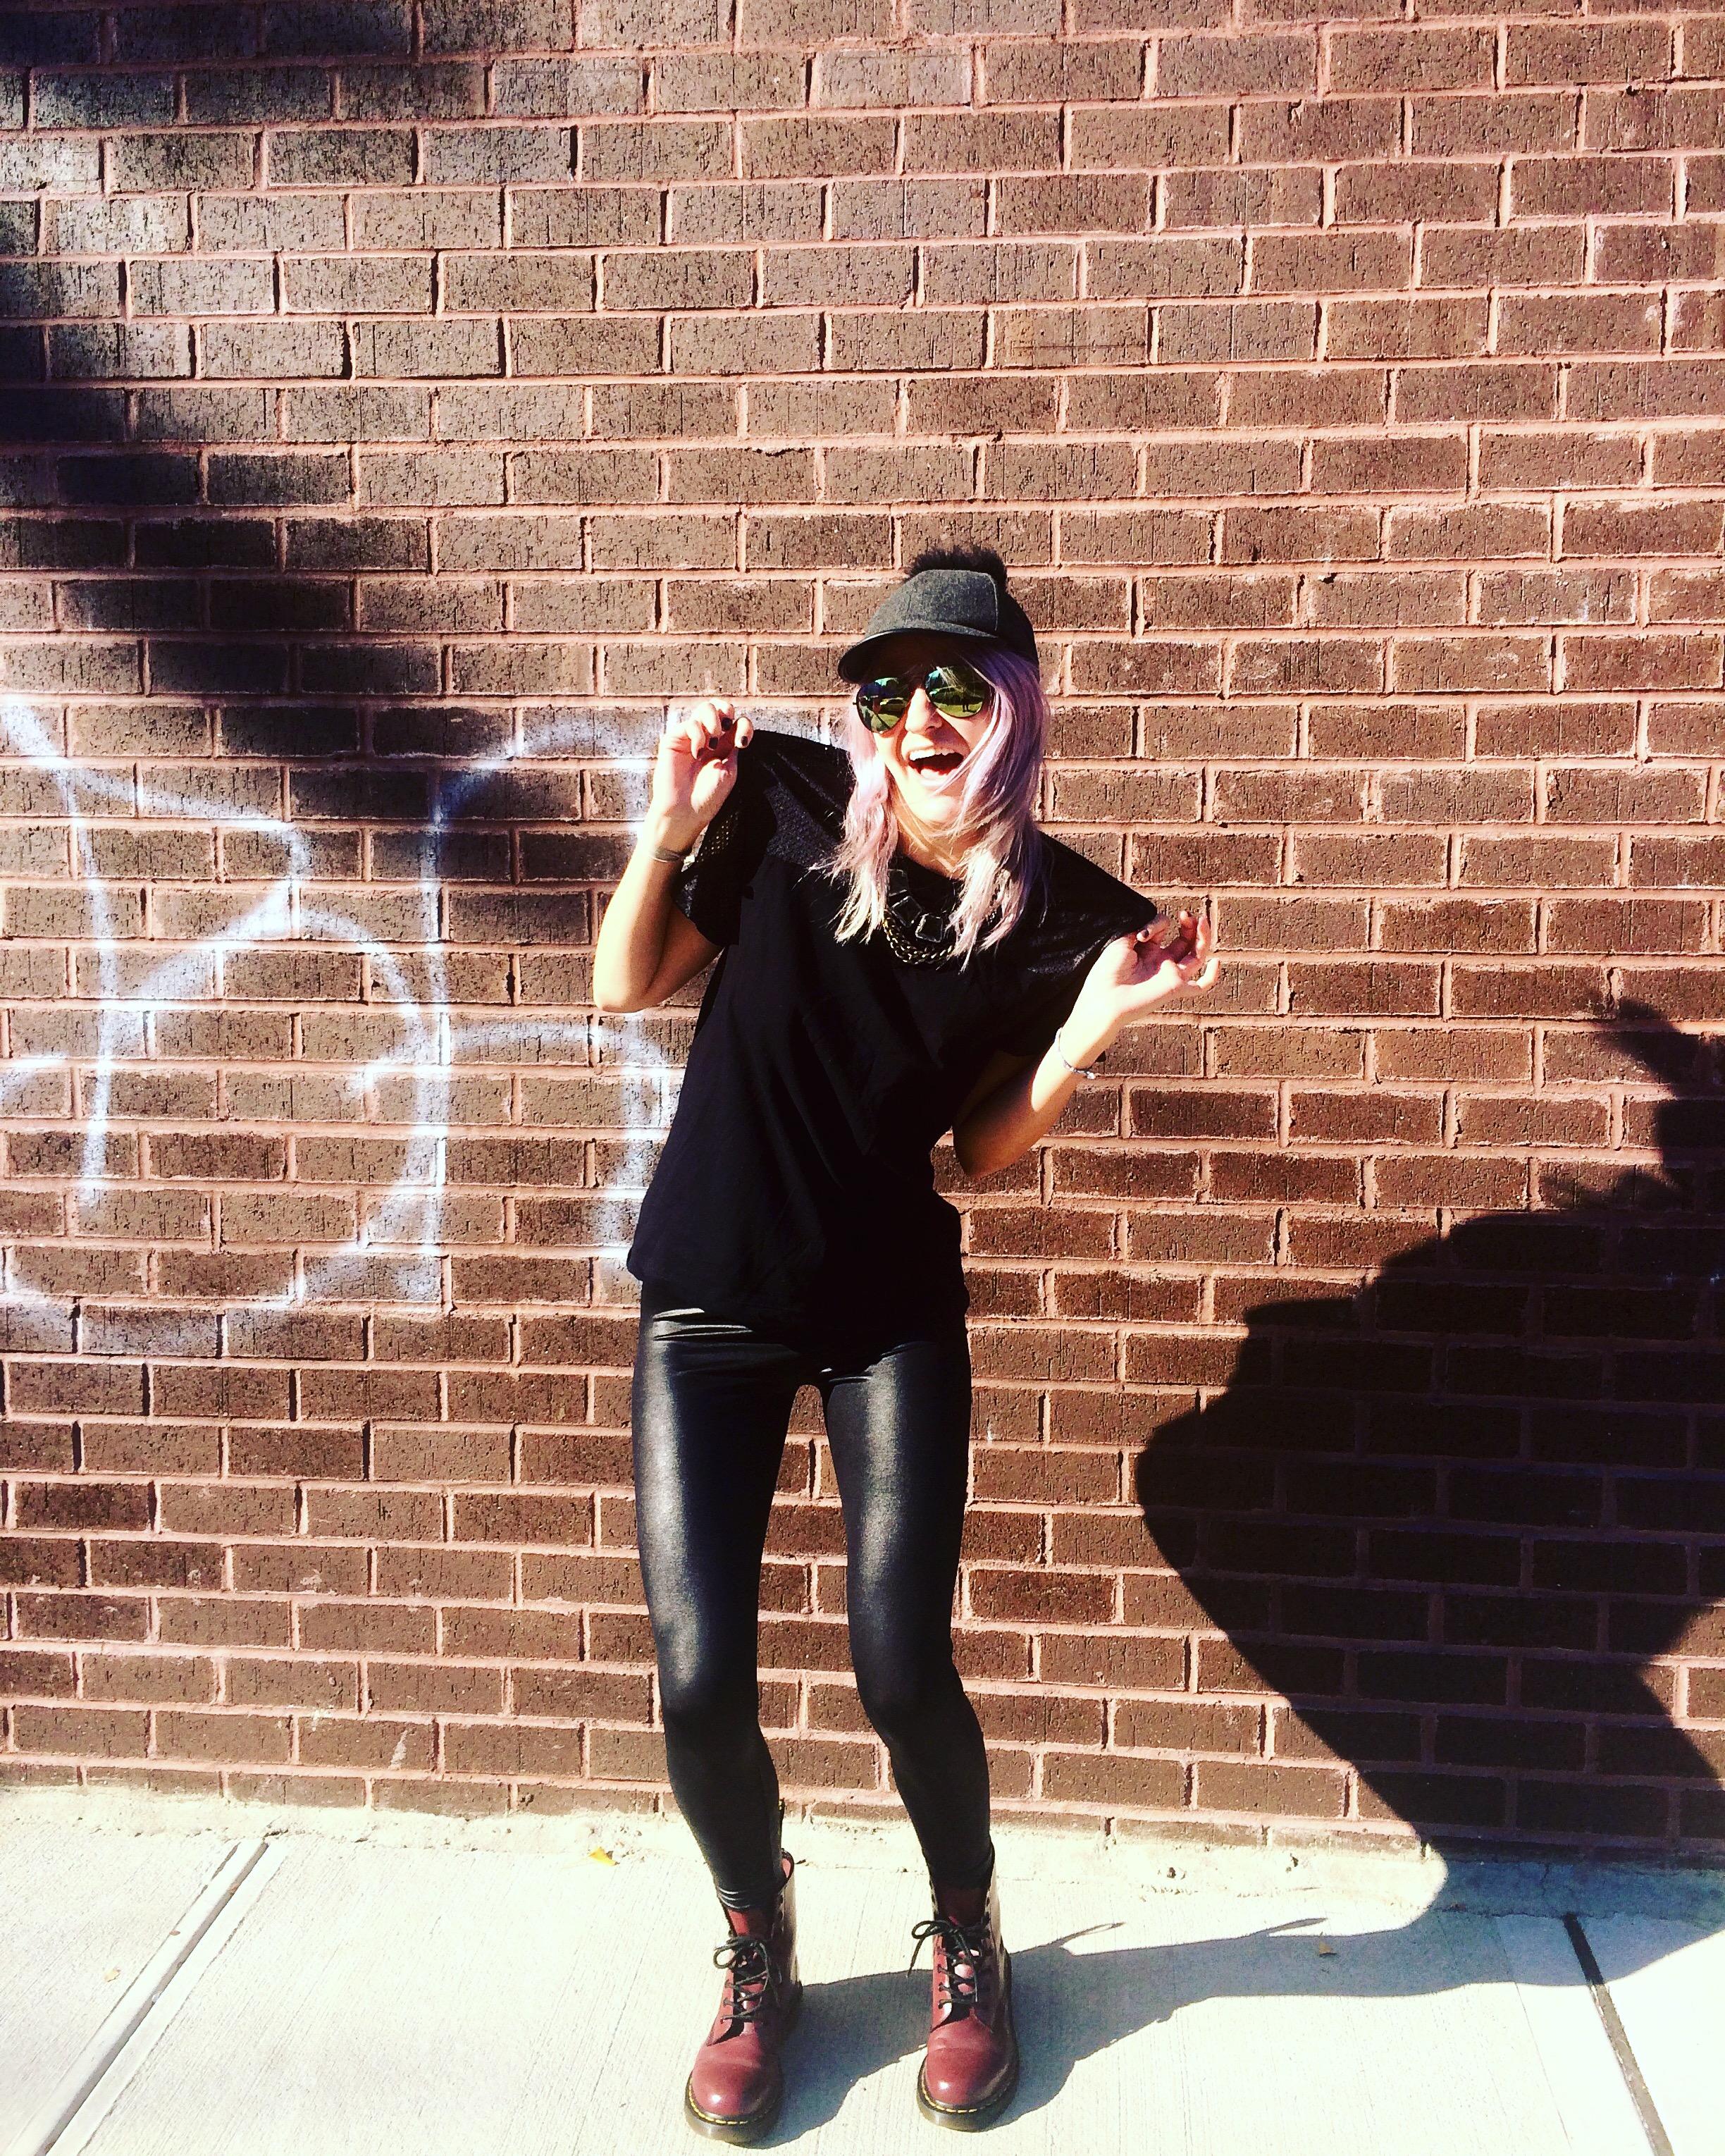 Cap: BCBG, Sunglasses: Nordstrom, Necklace: J.Crew, Mesh Black Tee: American Apparel, Pleather Leggings: HUE, Boots: Doc Marten  Location: Bushwick, Brooklyn;Photos by: Victoria Kass